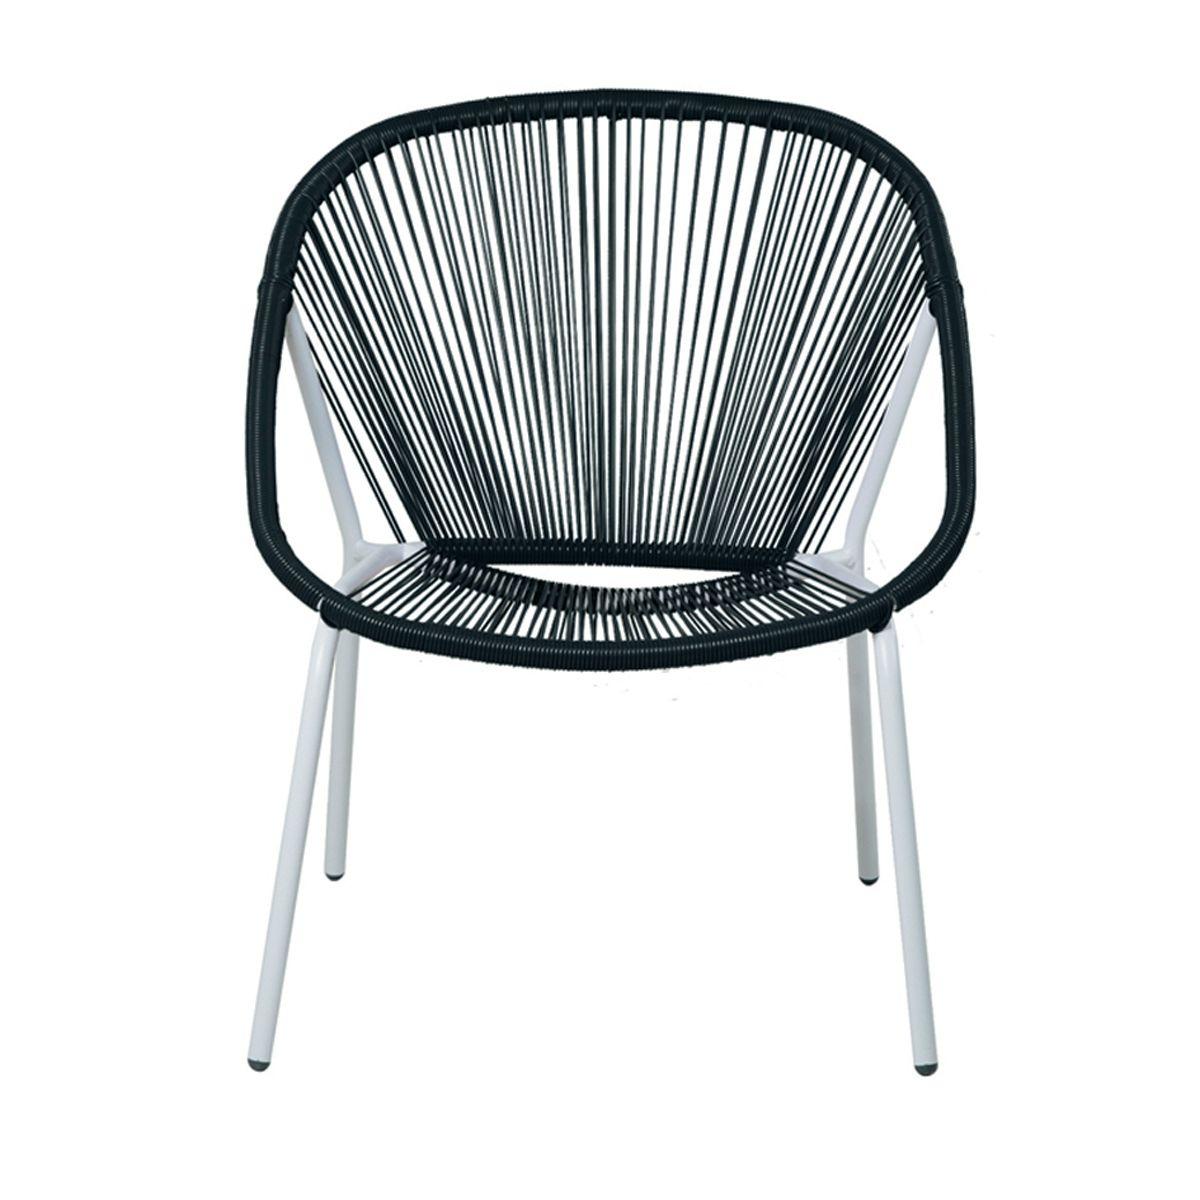 Leroy merlin tavoli da giardino plastica for Leroy merlin sedie esterno